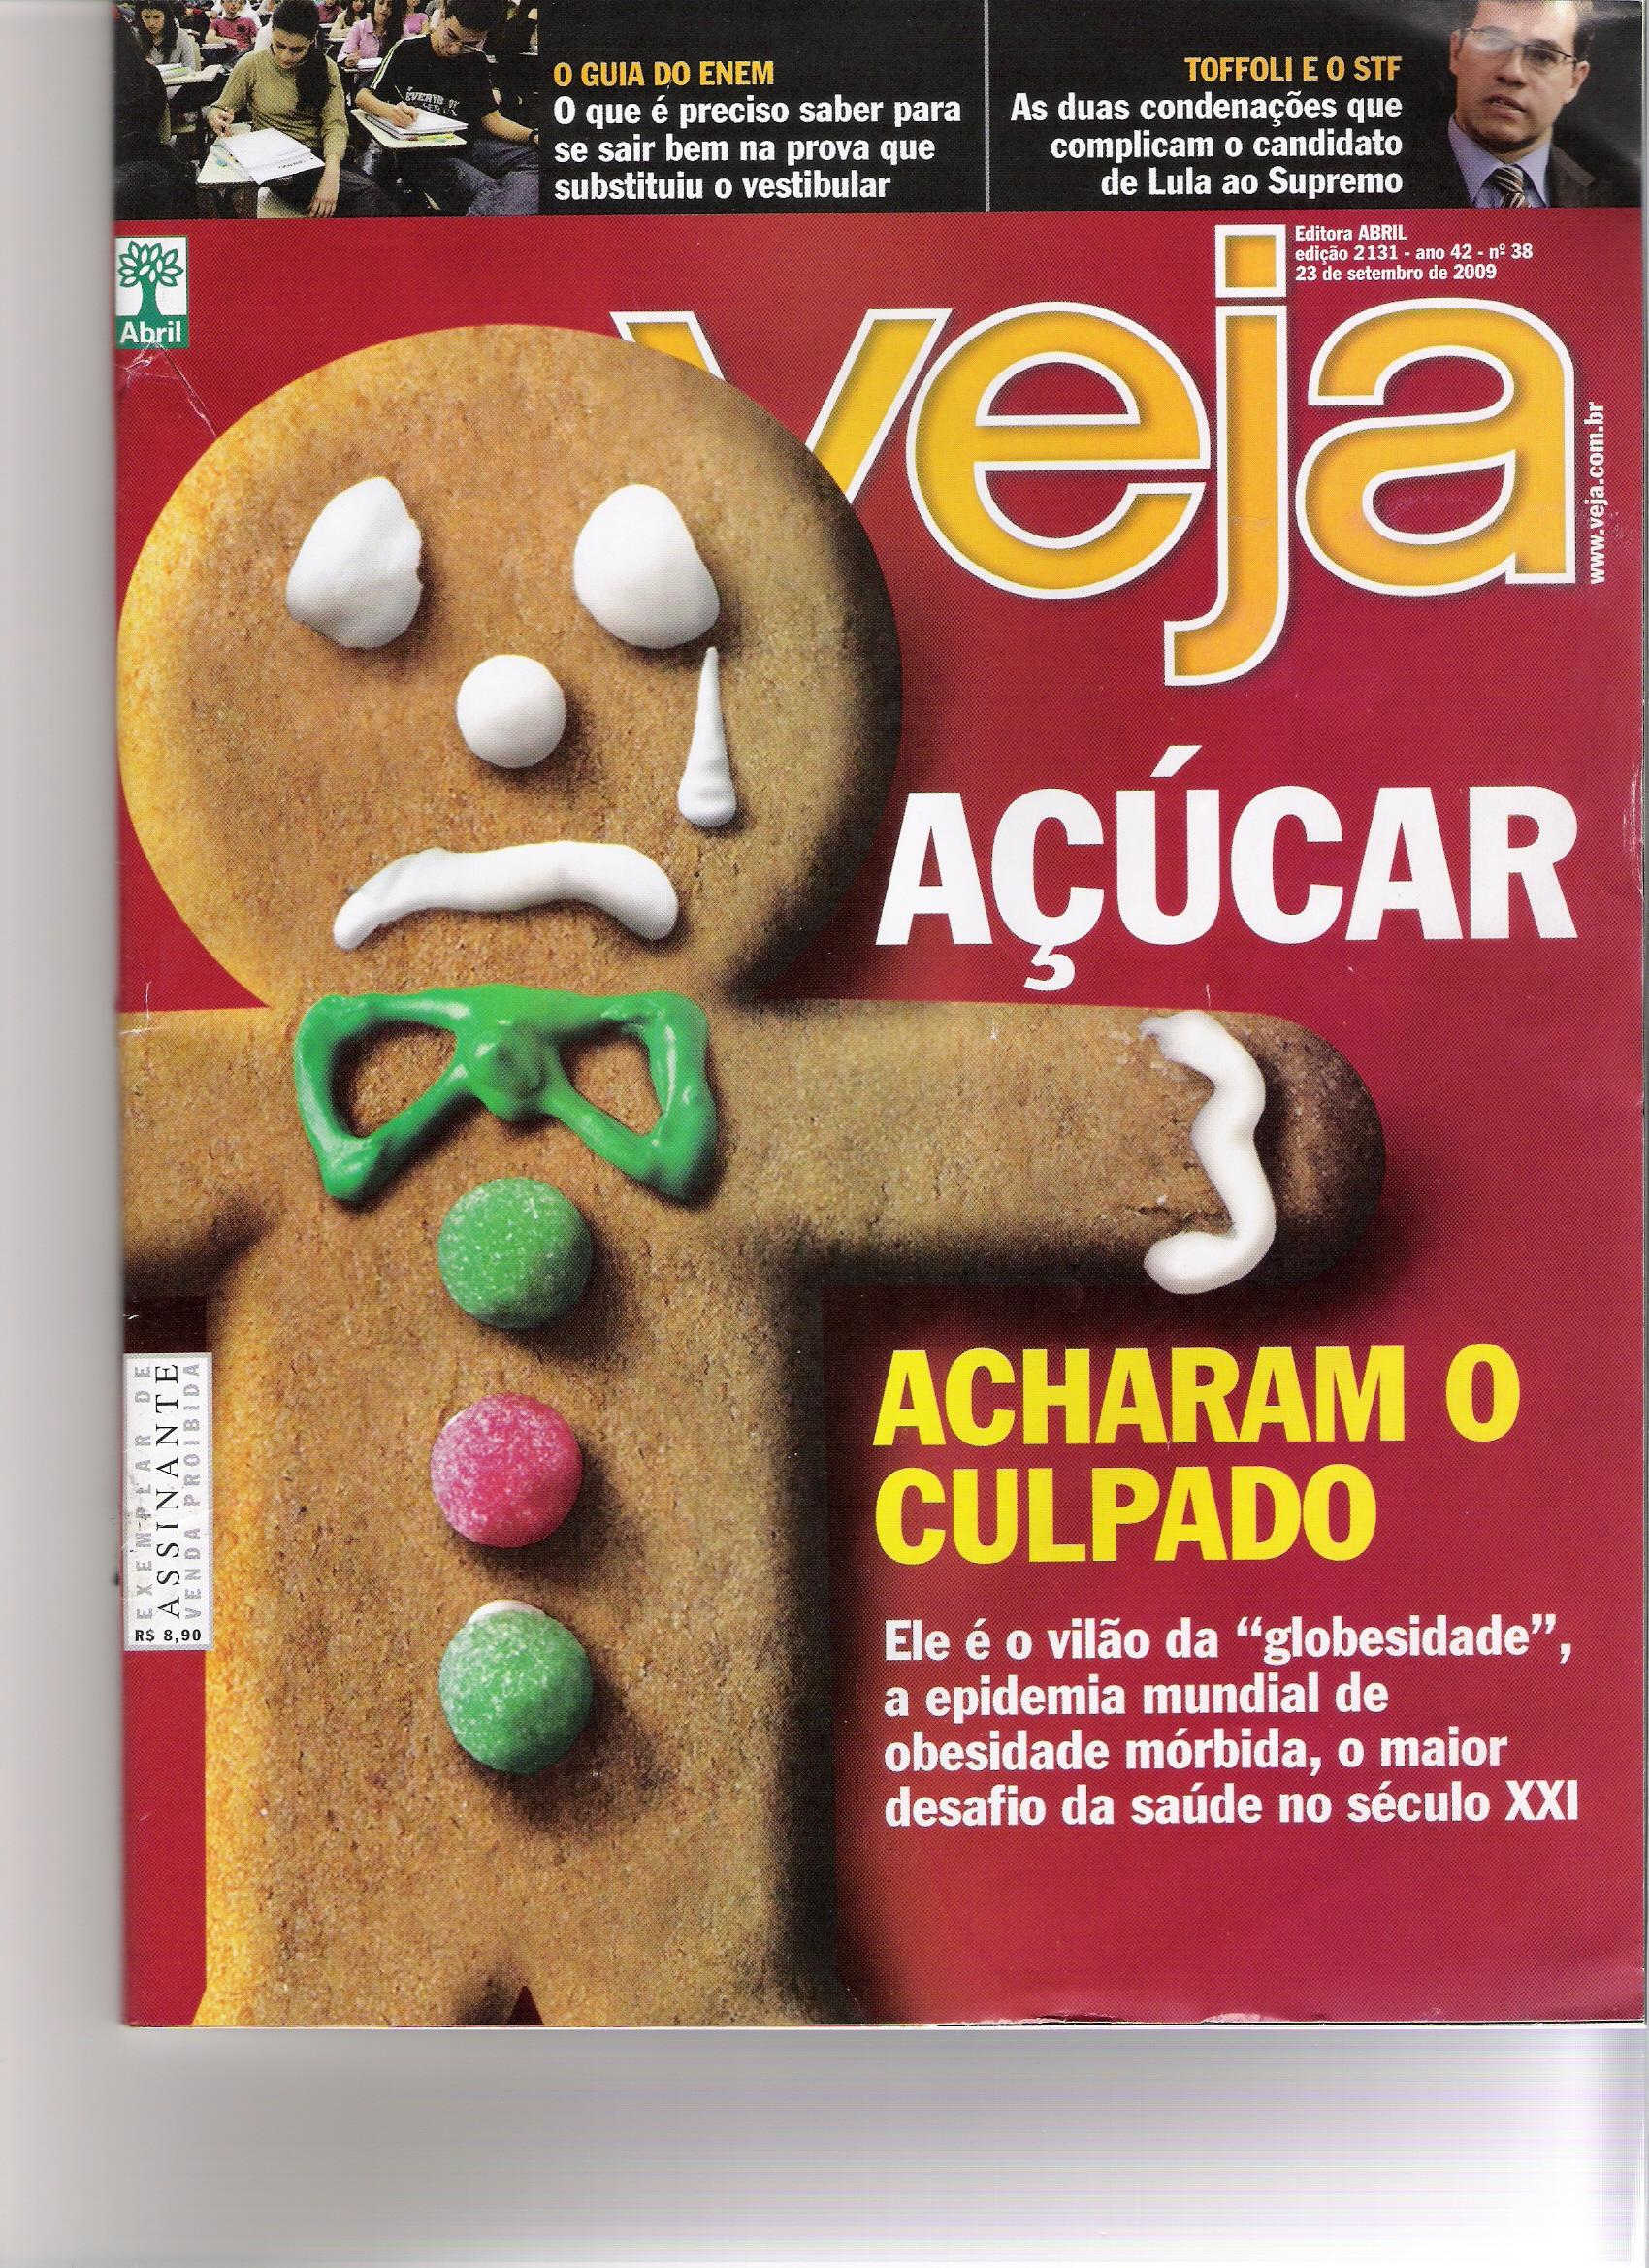 23/09/09- Revista Veja